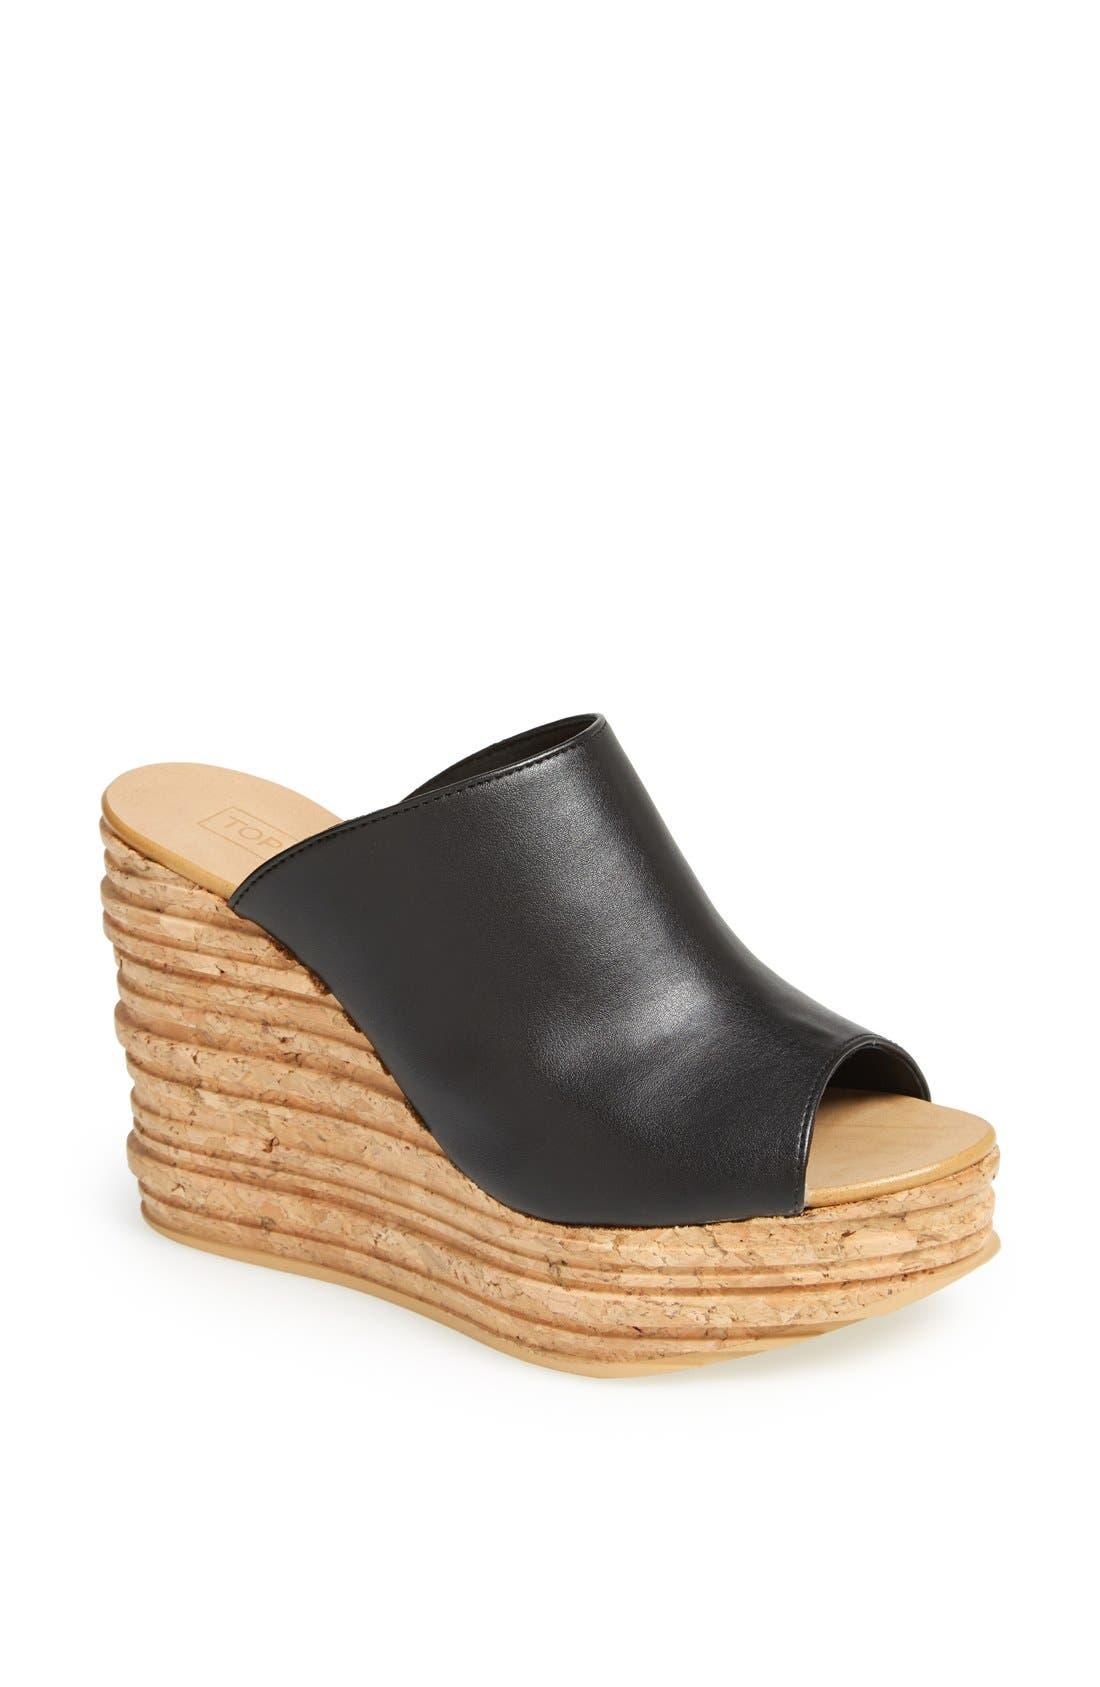 Main Image - Topshop 'Walnut' Wedge Mule Sandal